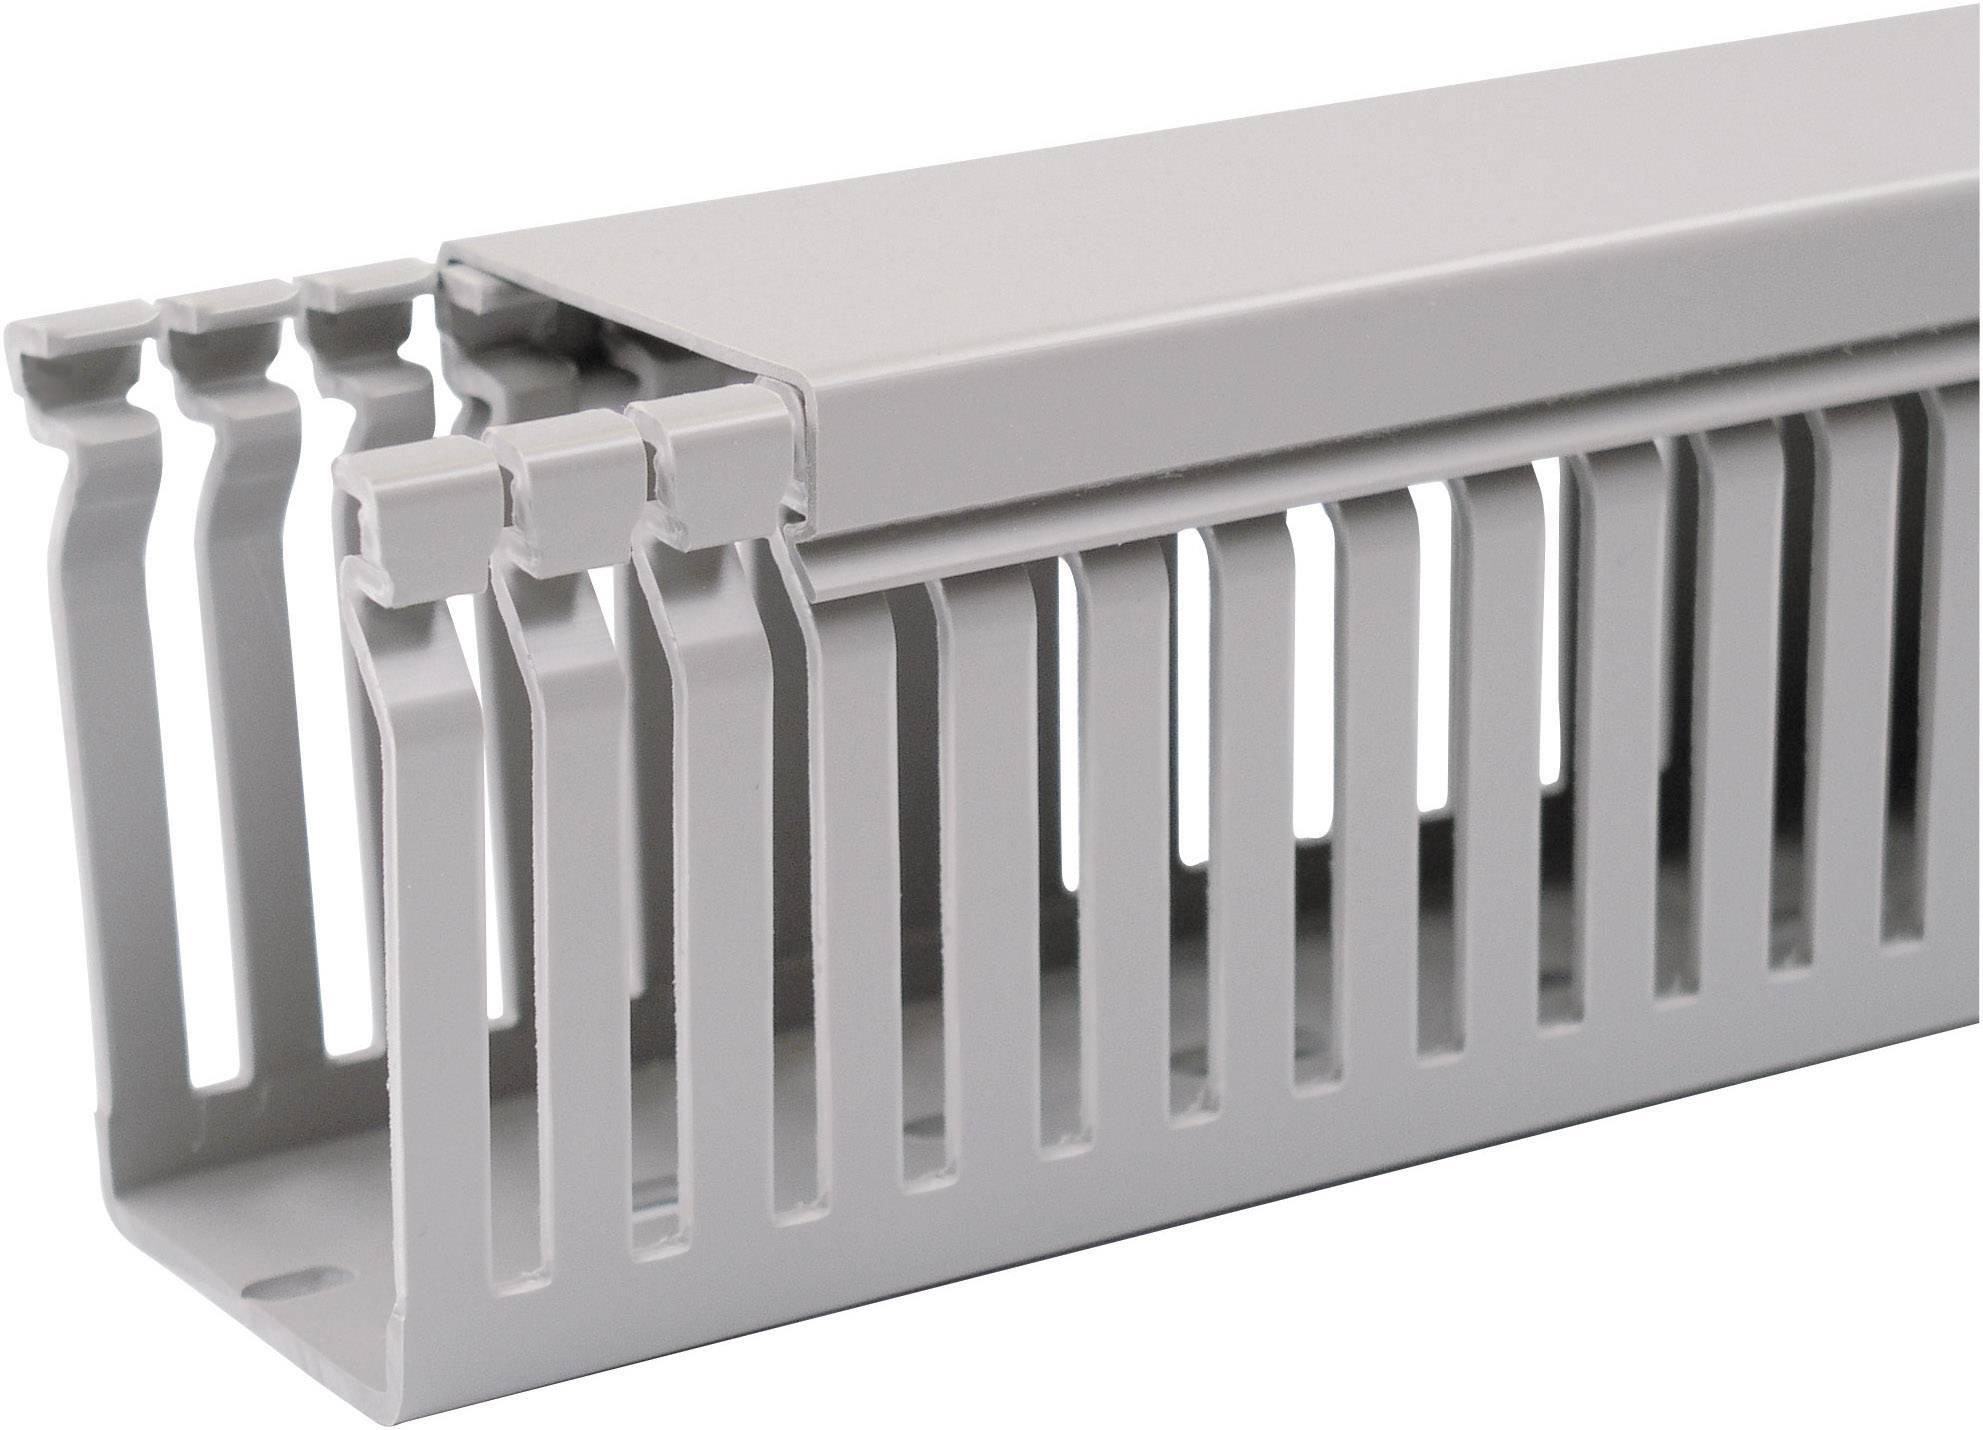 Elektroinstalační lišta OBO Bettermann, 6178016, 80x40 mm, 2 m, šedá